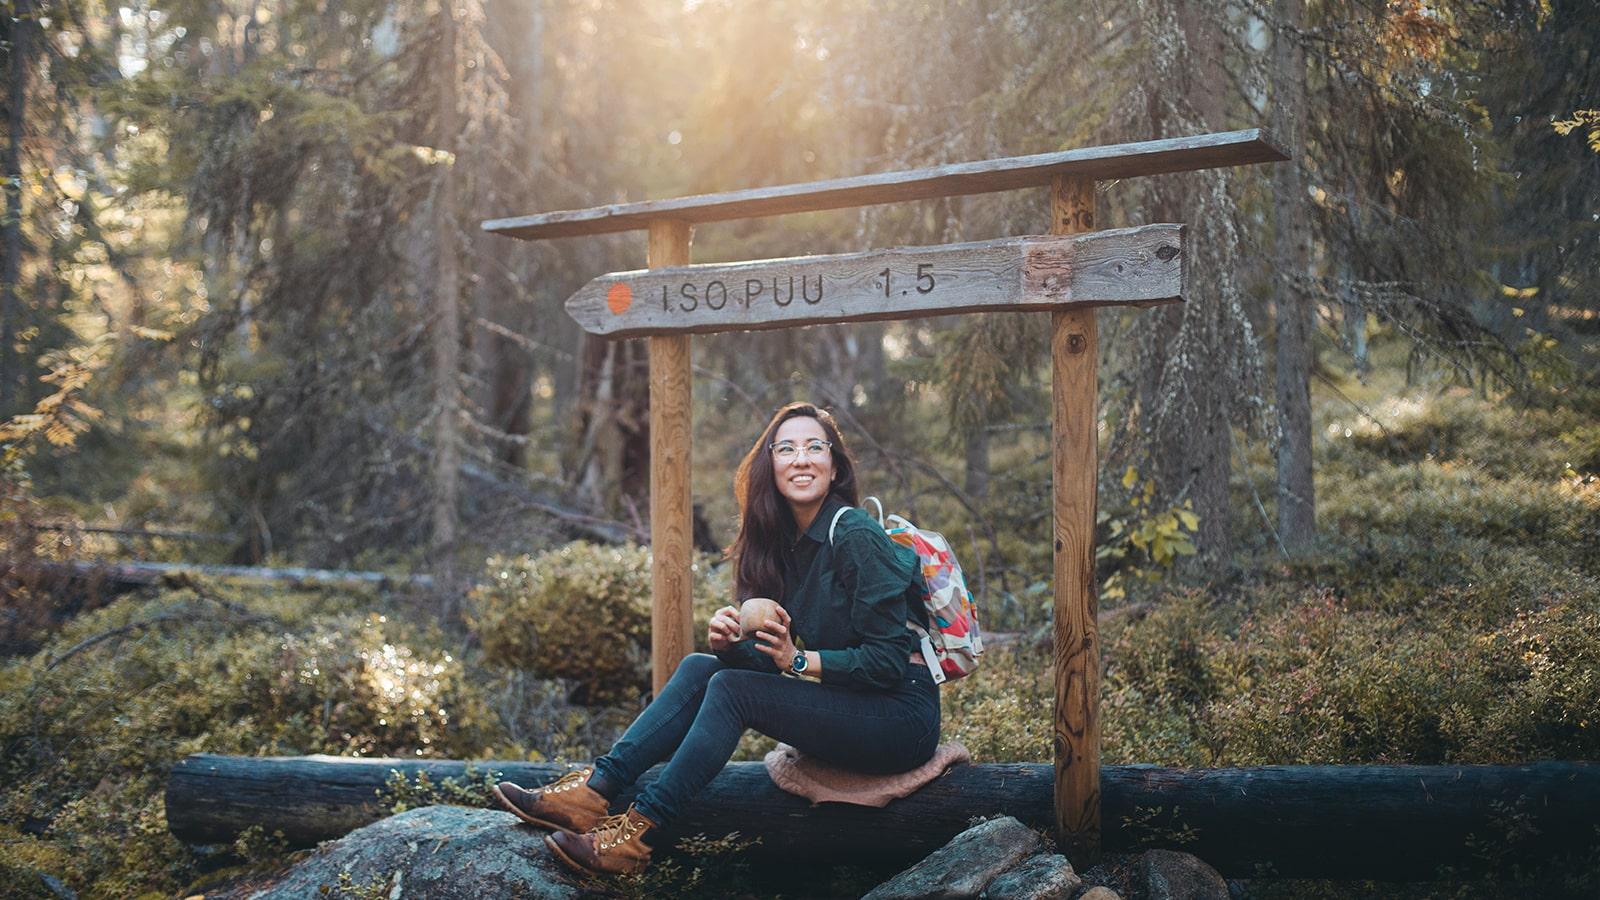 Person camping at Pyhä-Häkki National Park